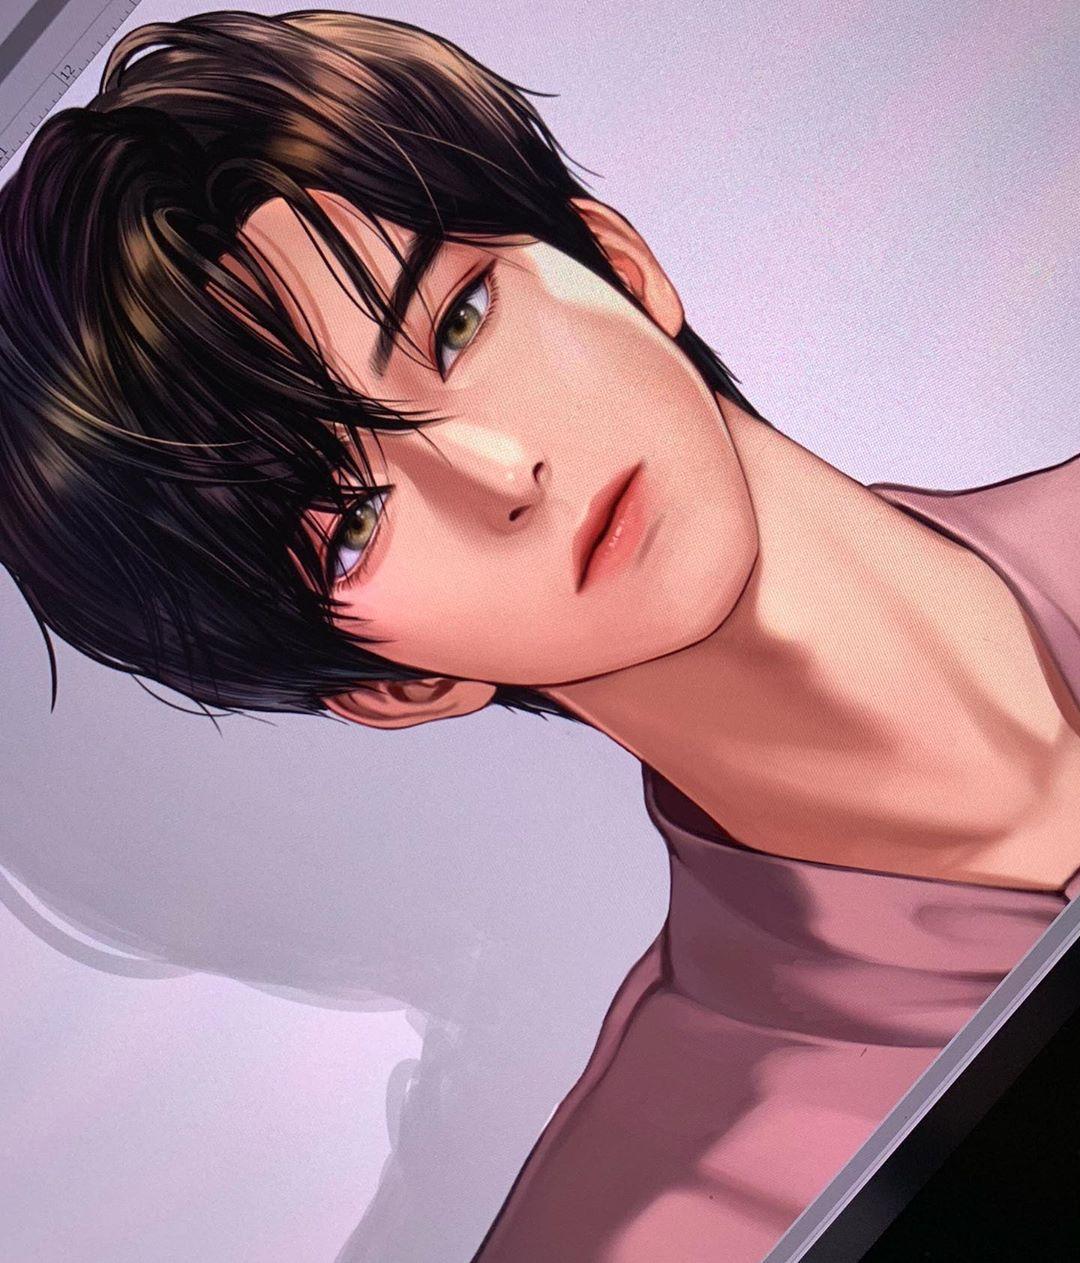 Kpop Hairstyles Female 2019: Korean Anime Boy Kpop